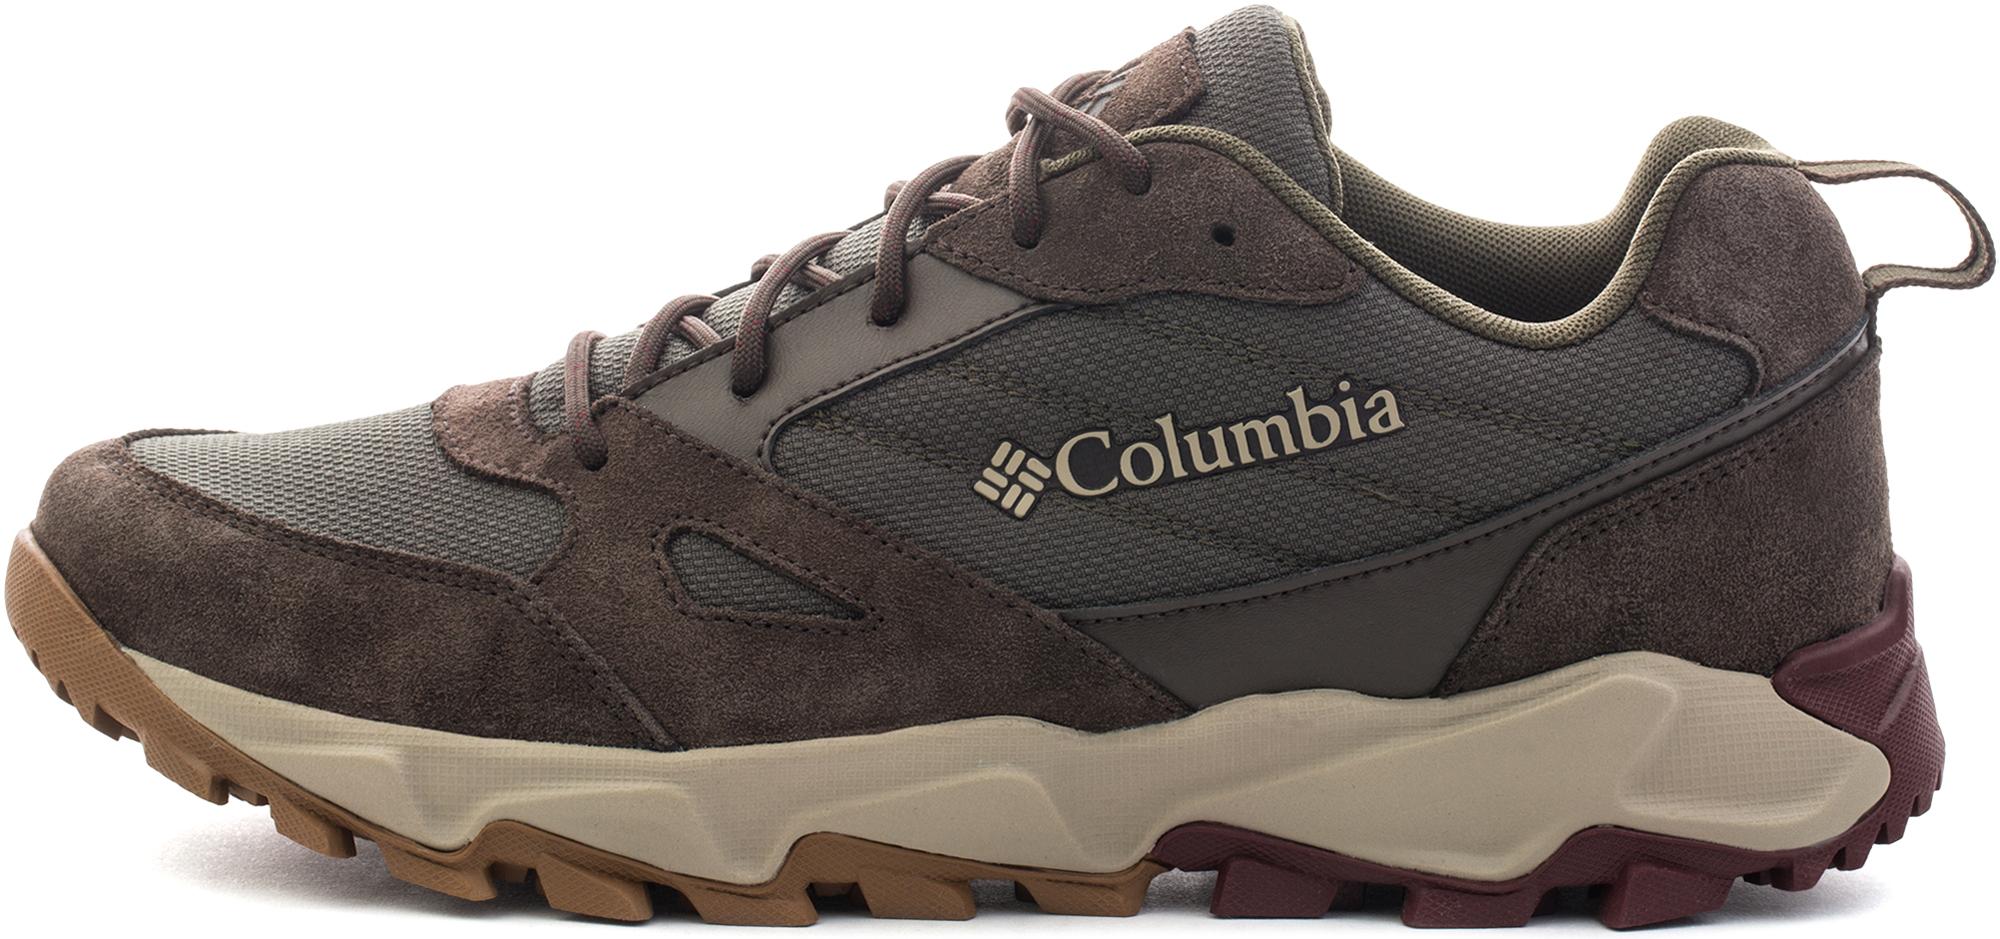 Columbia Ботинки мужские Columbia Ivo Trail, размер 45